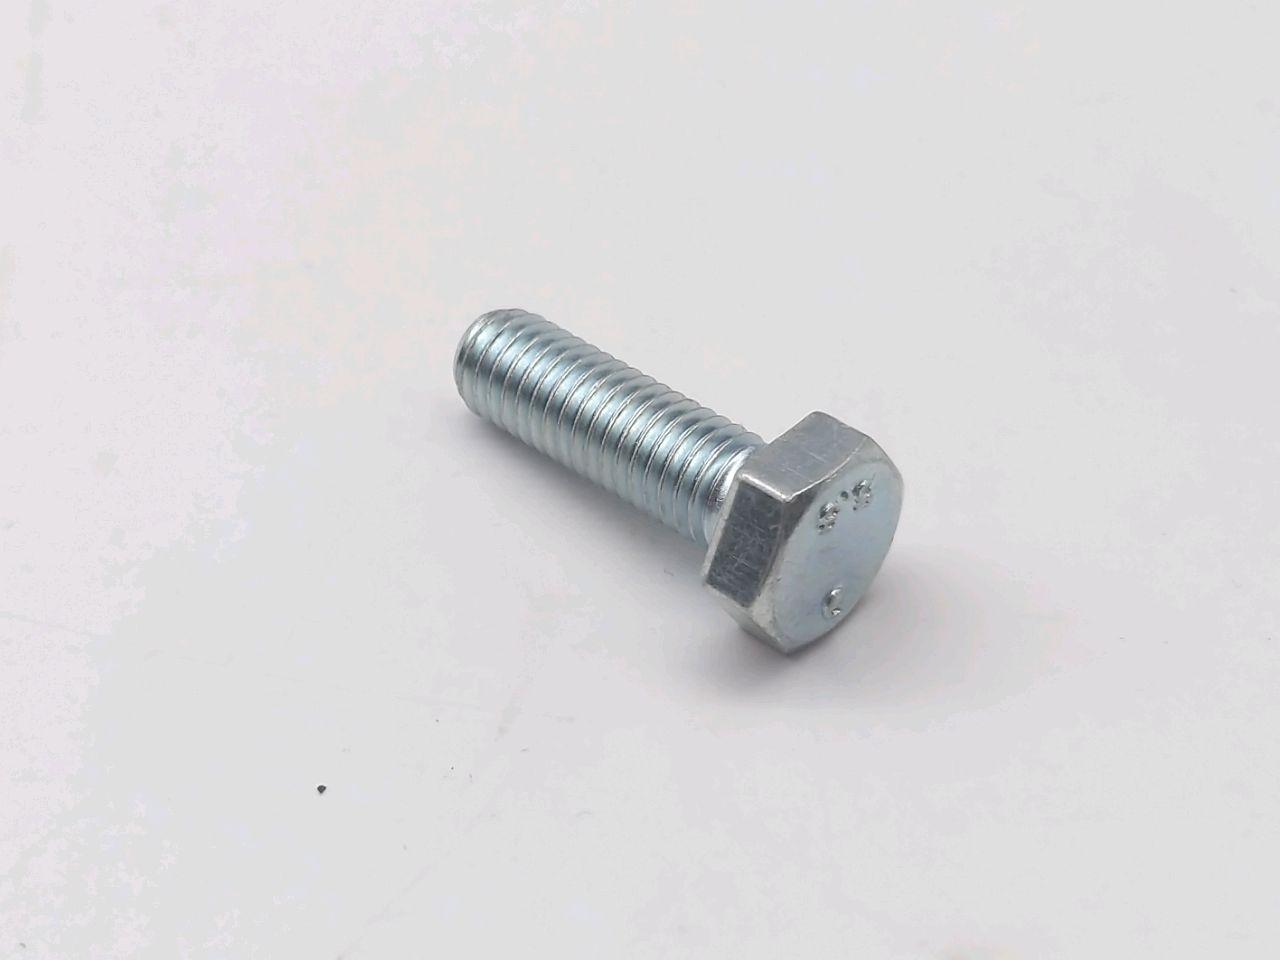 Bulon 8x25M zinc